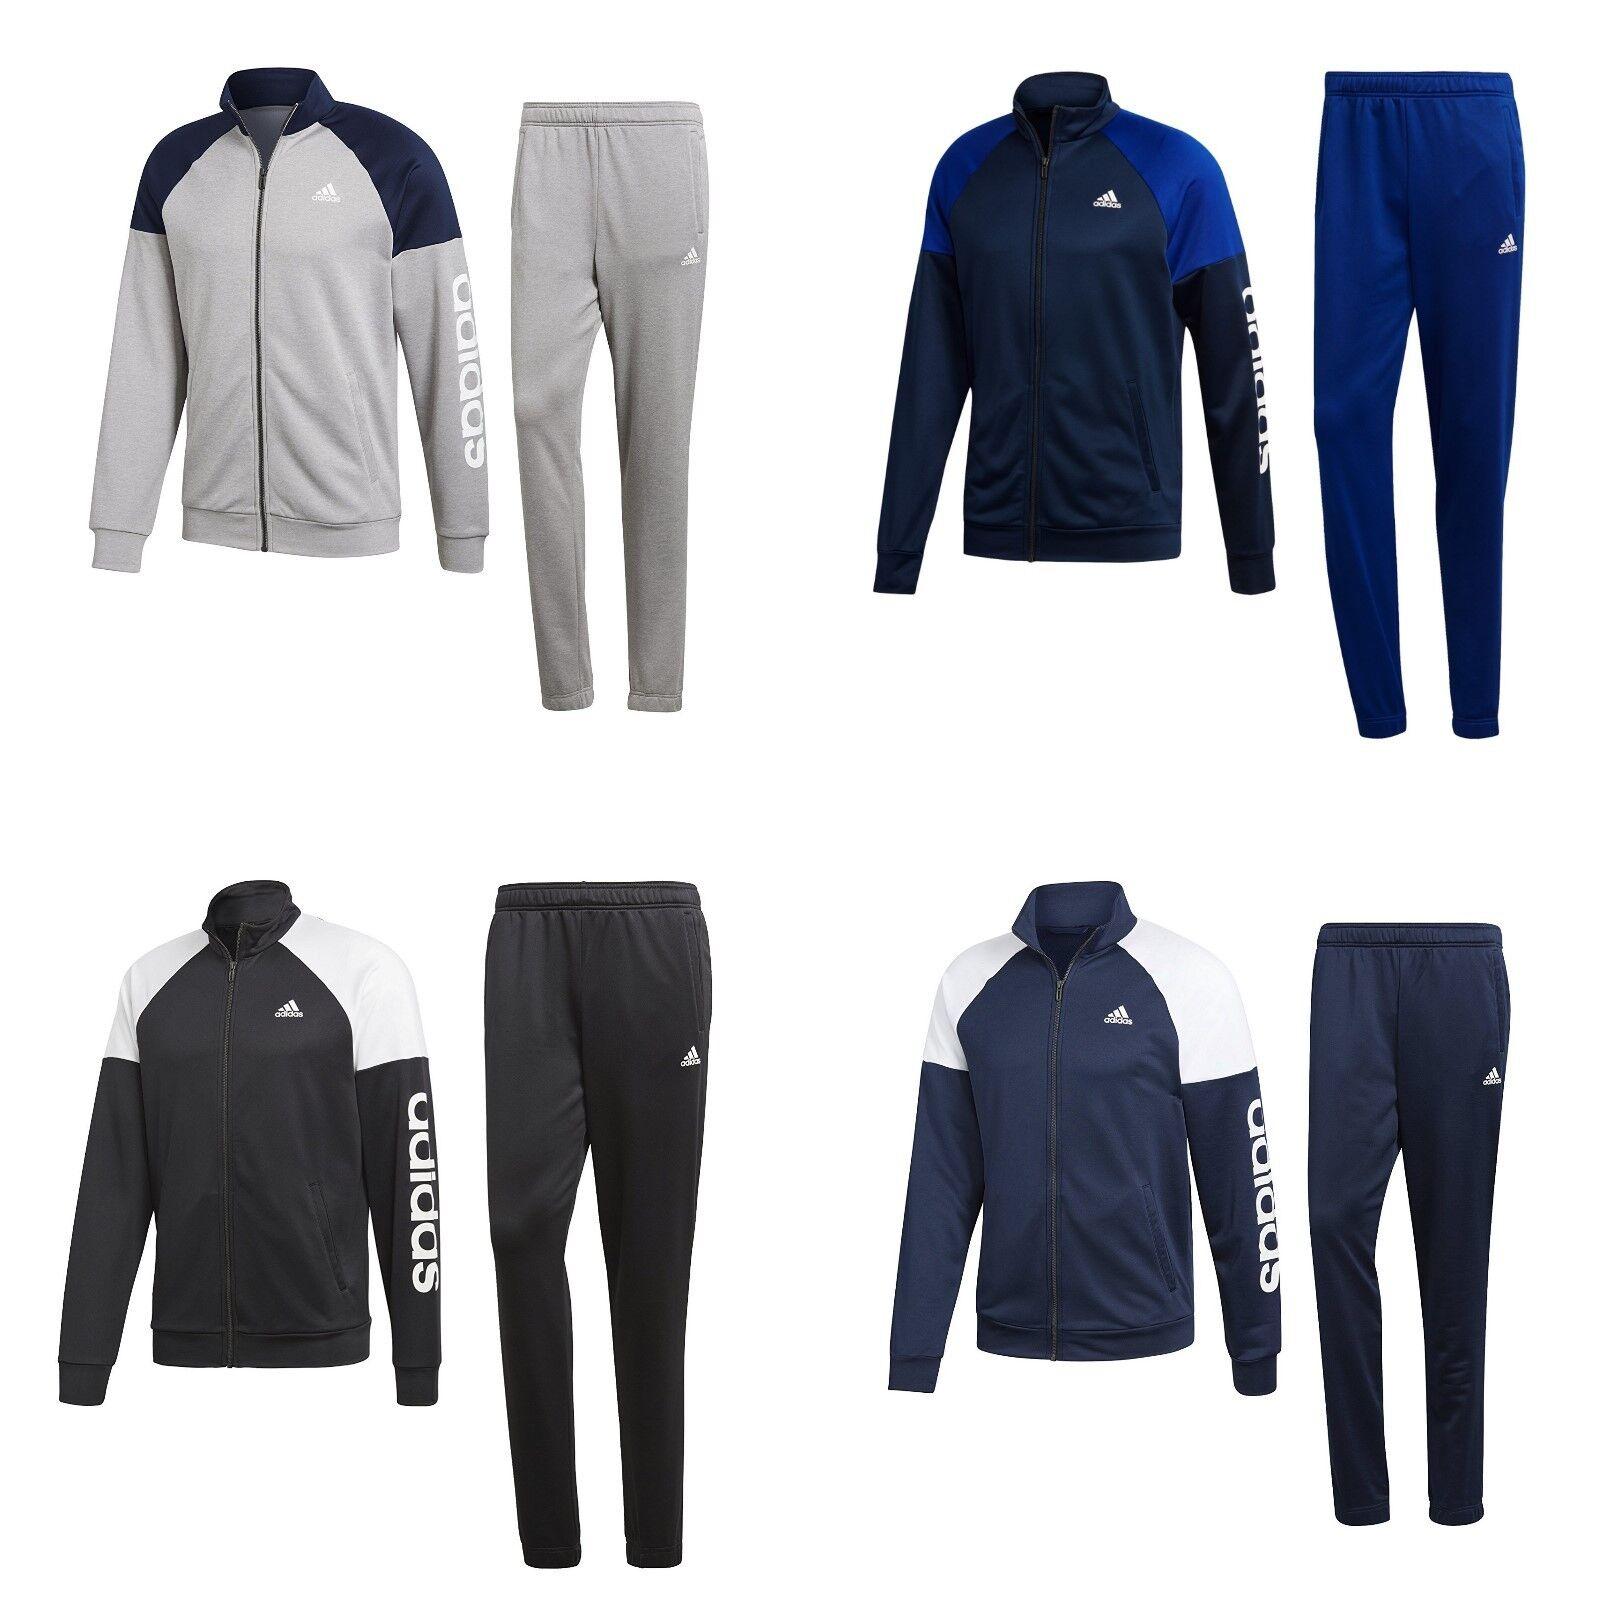 adidas Trainingsanzug Sportanzug Jogginganzug Herren Männer Dunkelblau